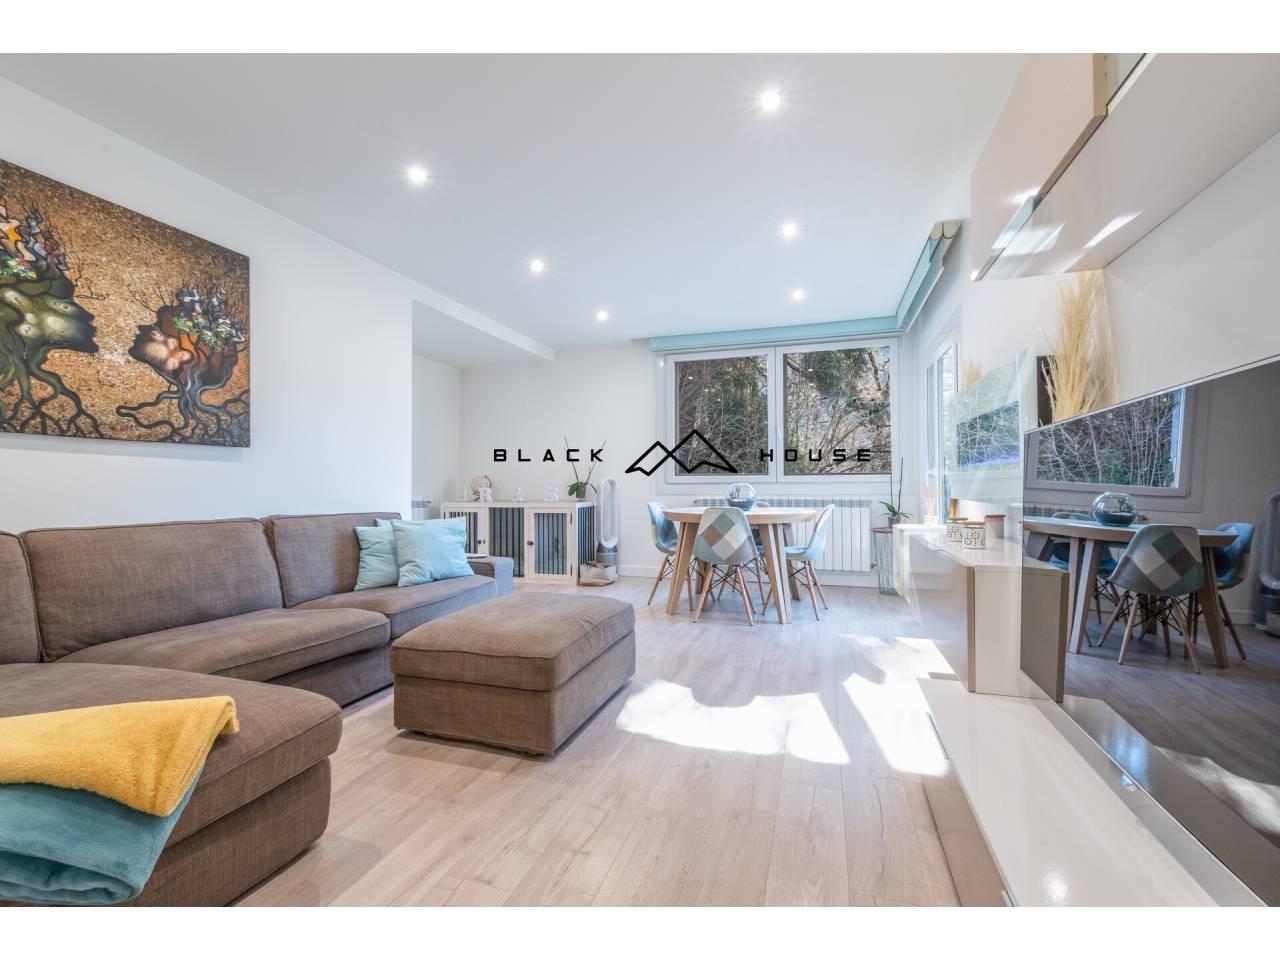 Fabulós dúplex per a vendre situat en zona residencial d´Escaldes.